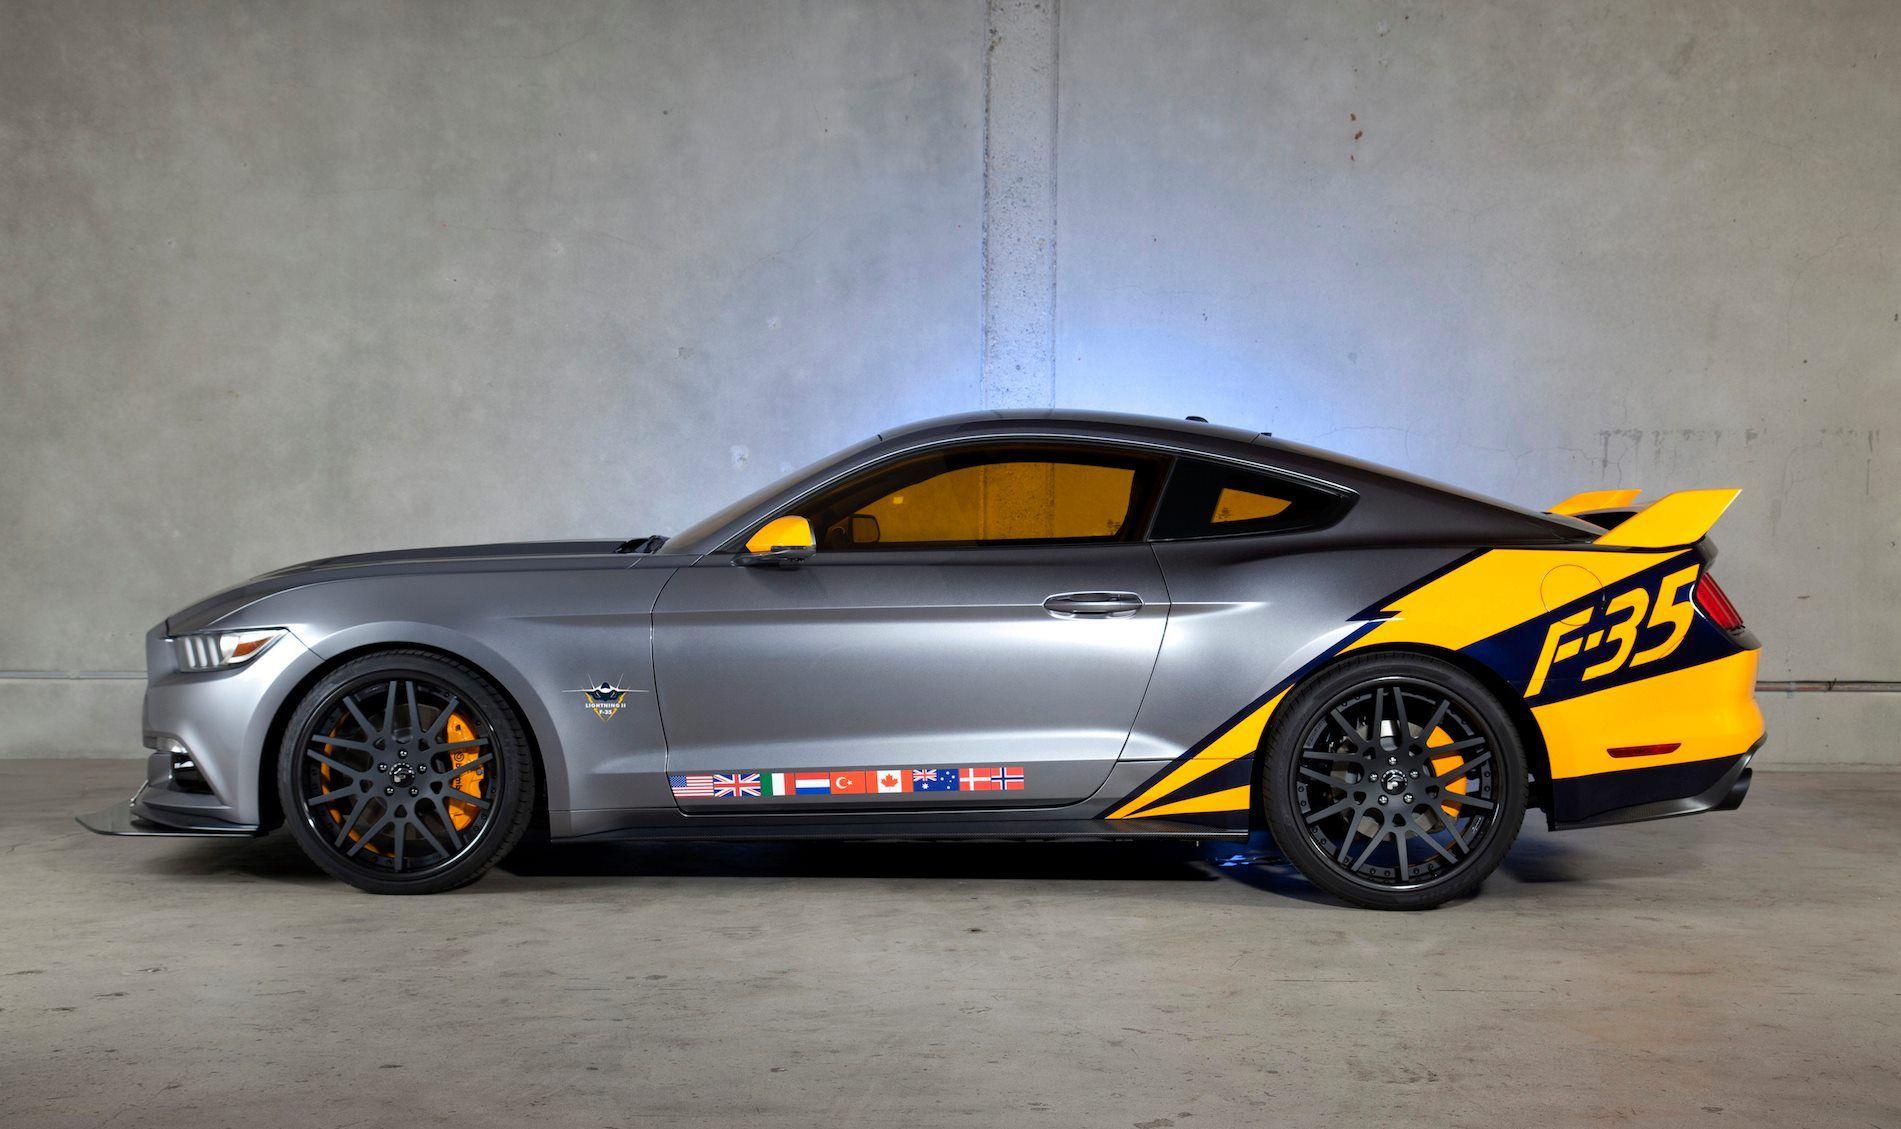 F35 Lightning II Edition Mustang Mustang cars, Ford